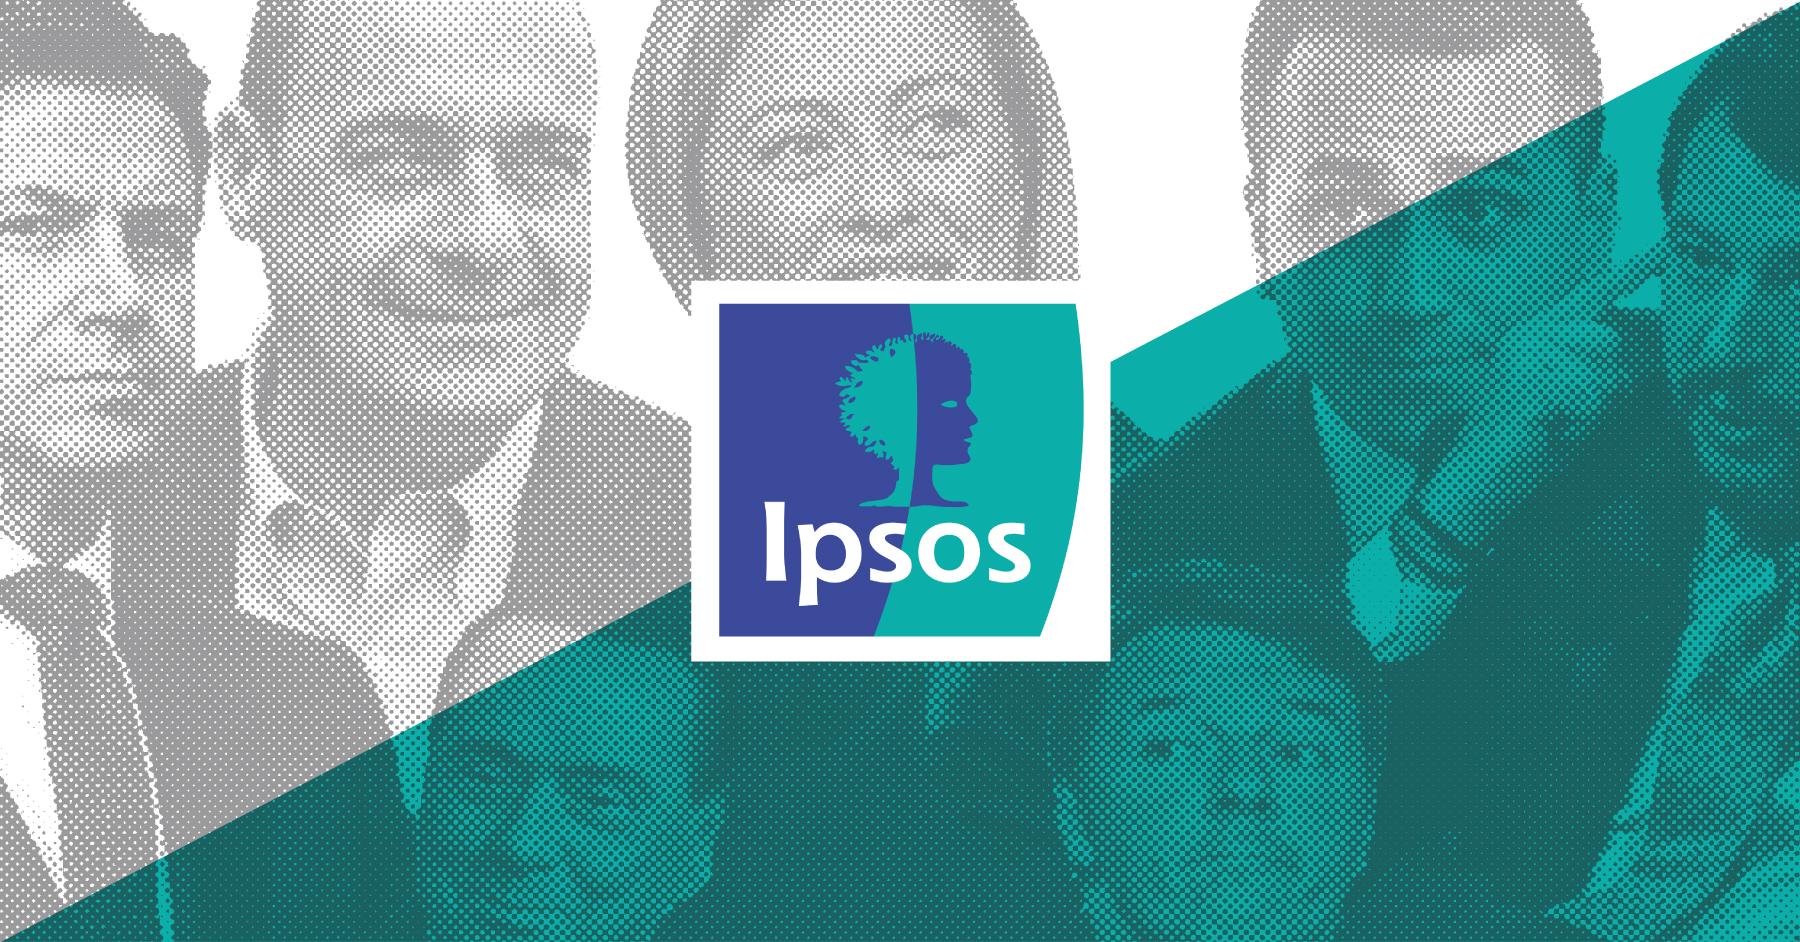 sondaggio, sondaggi politici ipsos, sondaggi elettorali ipsos